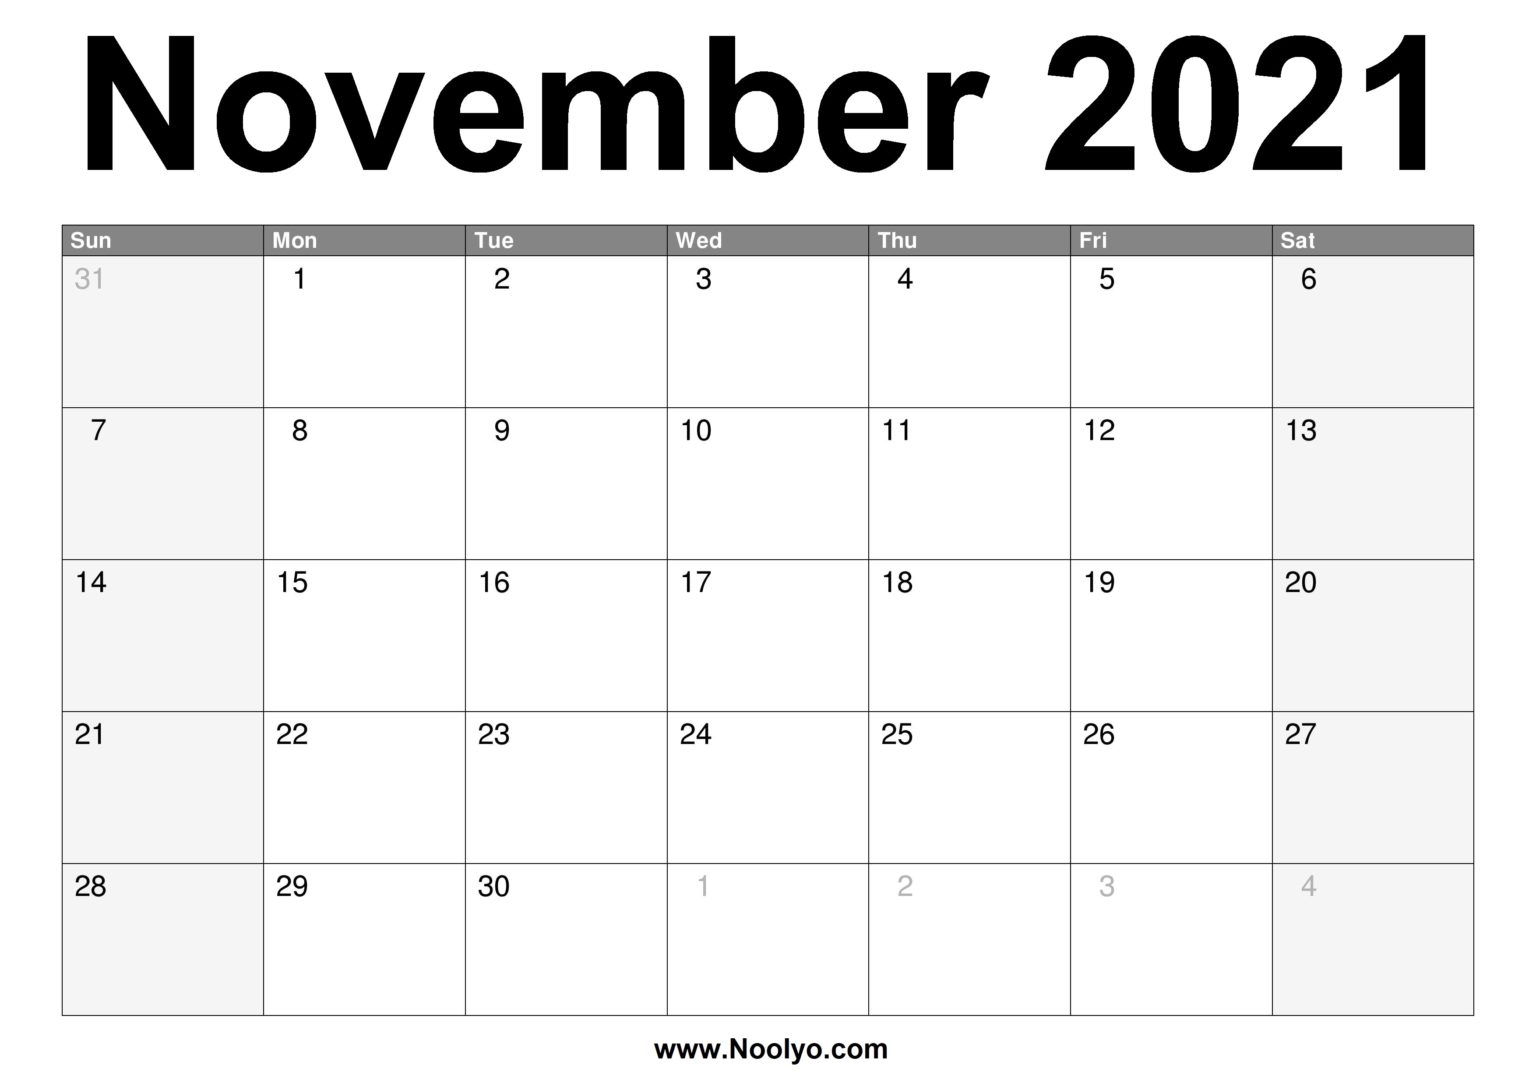 November 2021 Calendar Printable - Free Download - Noolyo